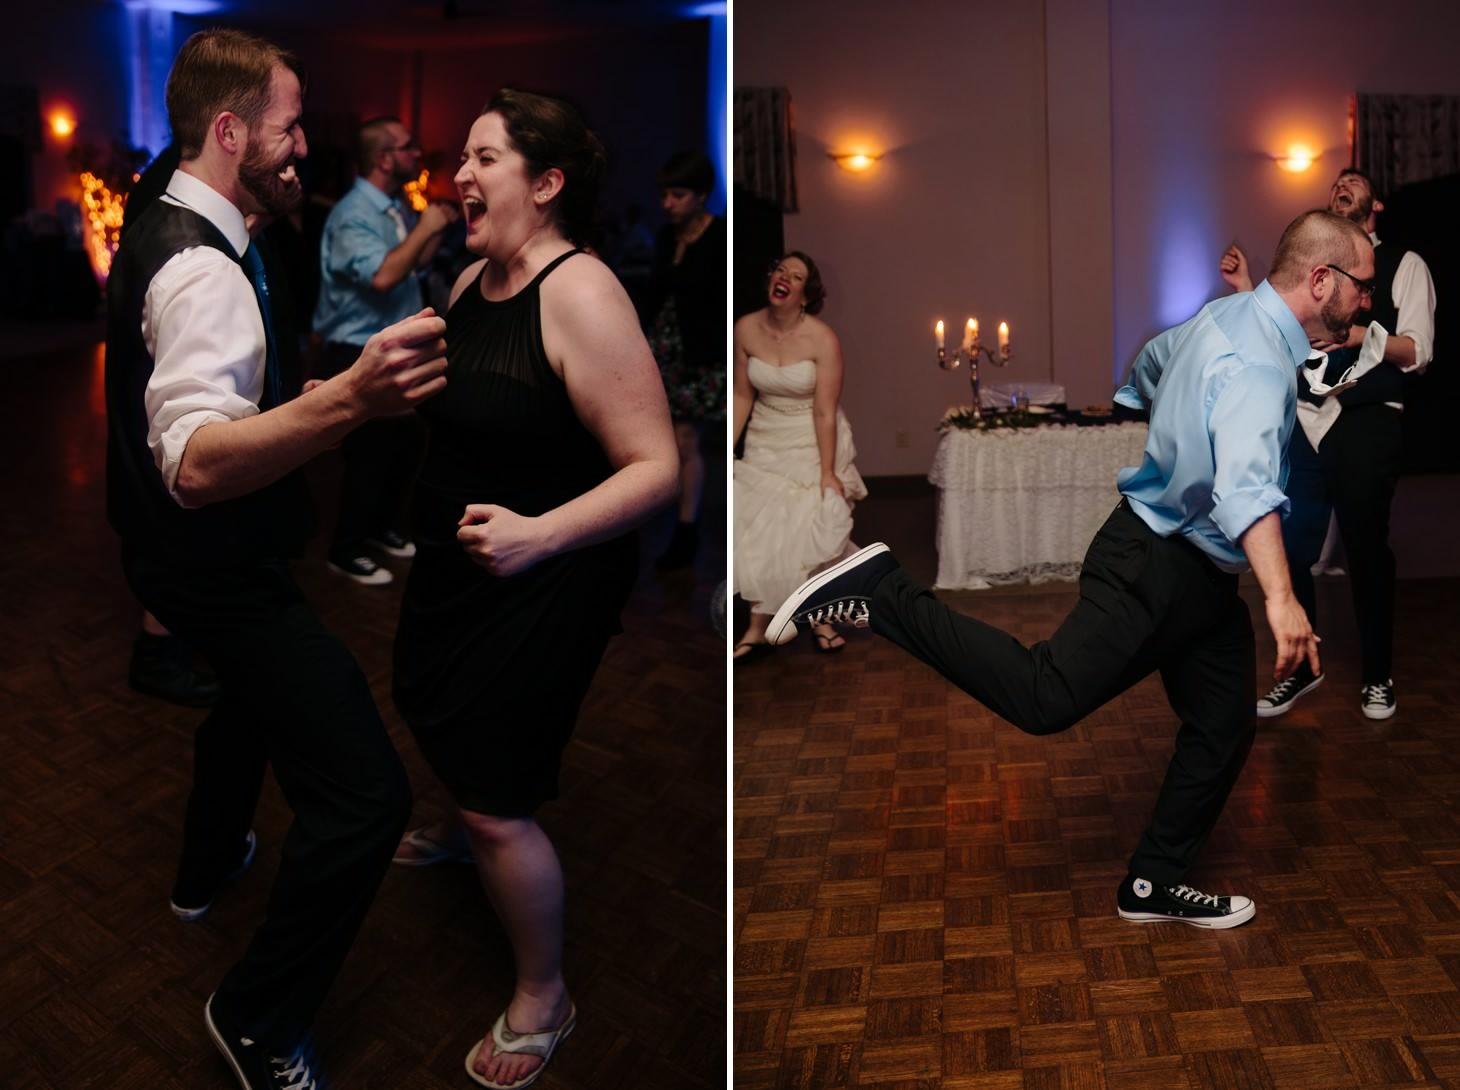 064-nyc-wedding-photographer-nj-nerdy-dr-who-firehouse-wedding-smitten-chickens.jpg